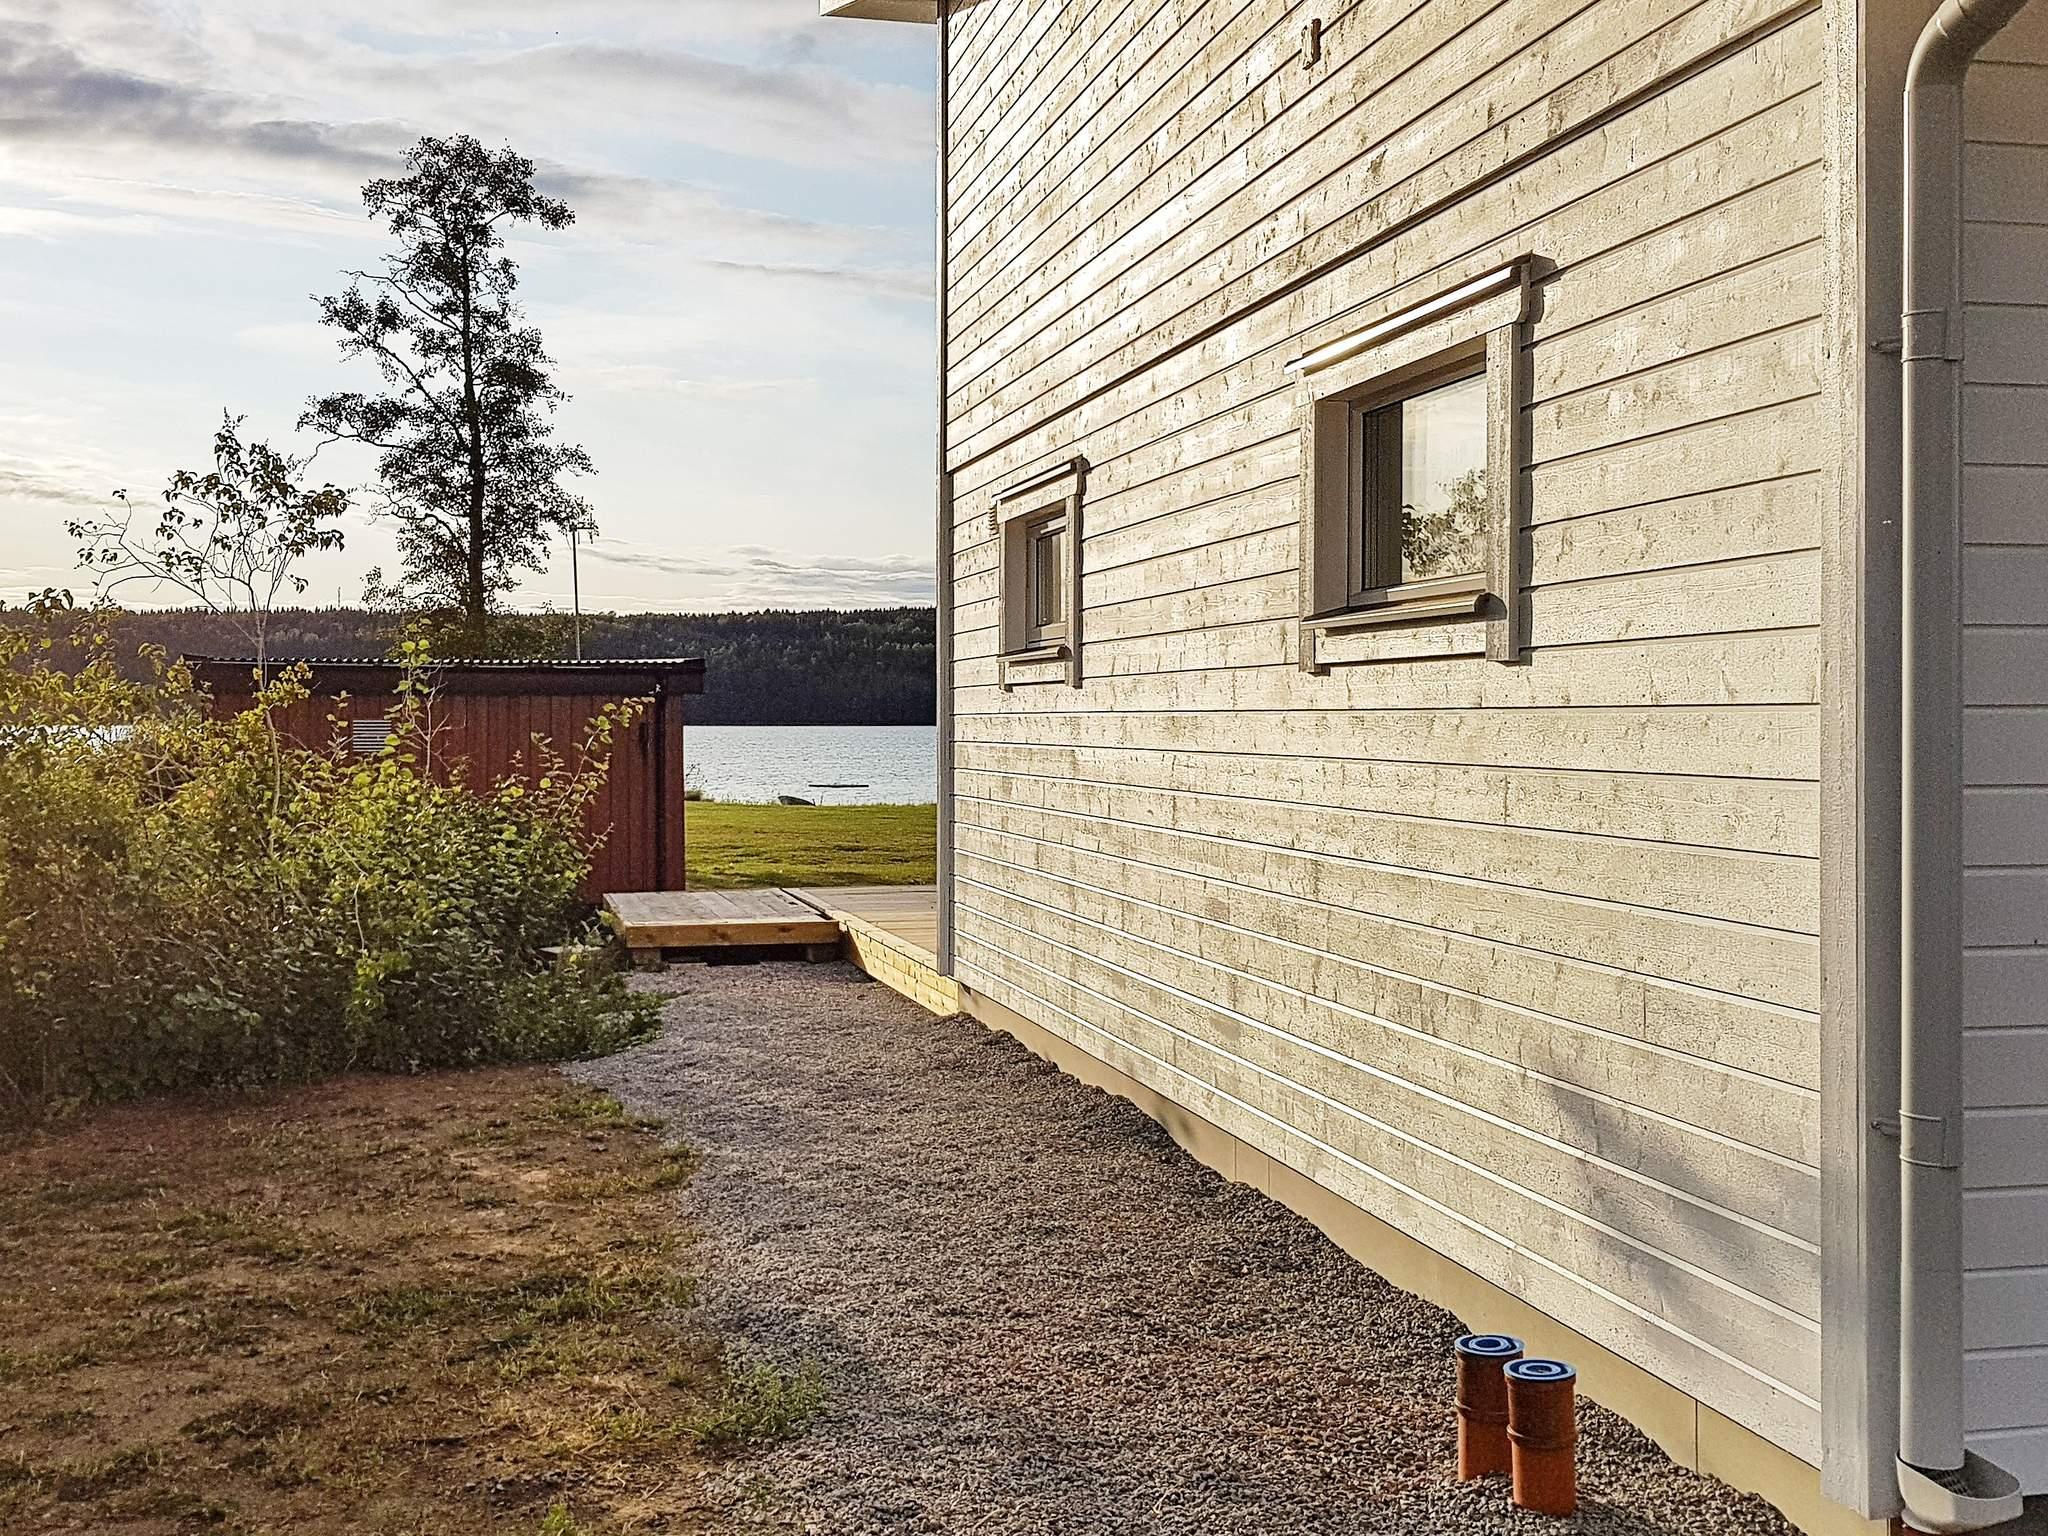 Ferienhaus Melldala (2505595), Lerdala, Västra Götaland län, Westschweden, Schweden, Bild 18